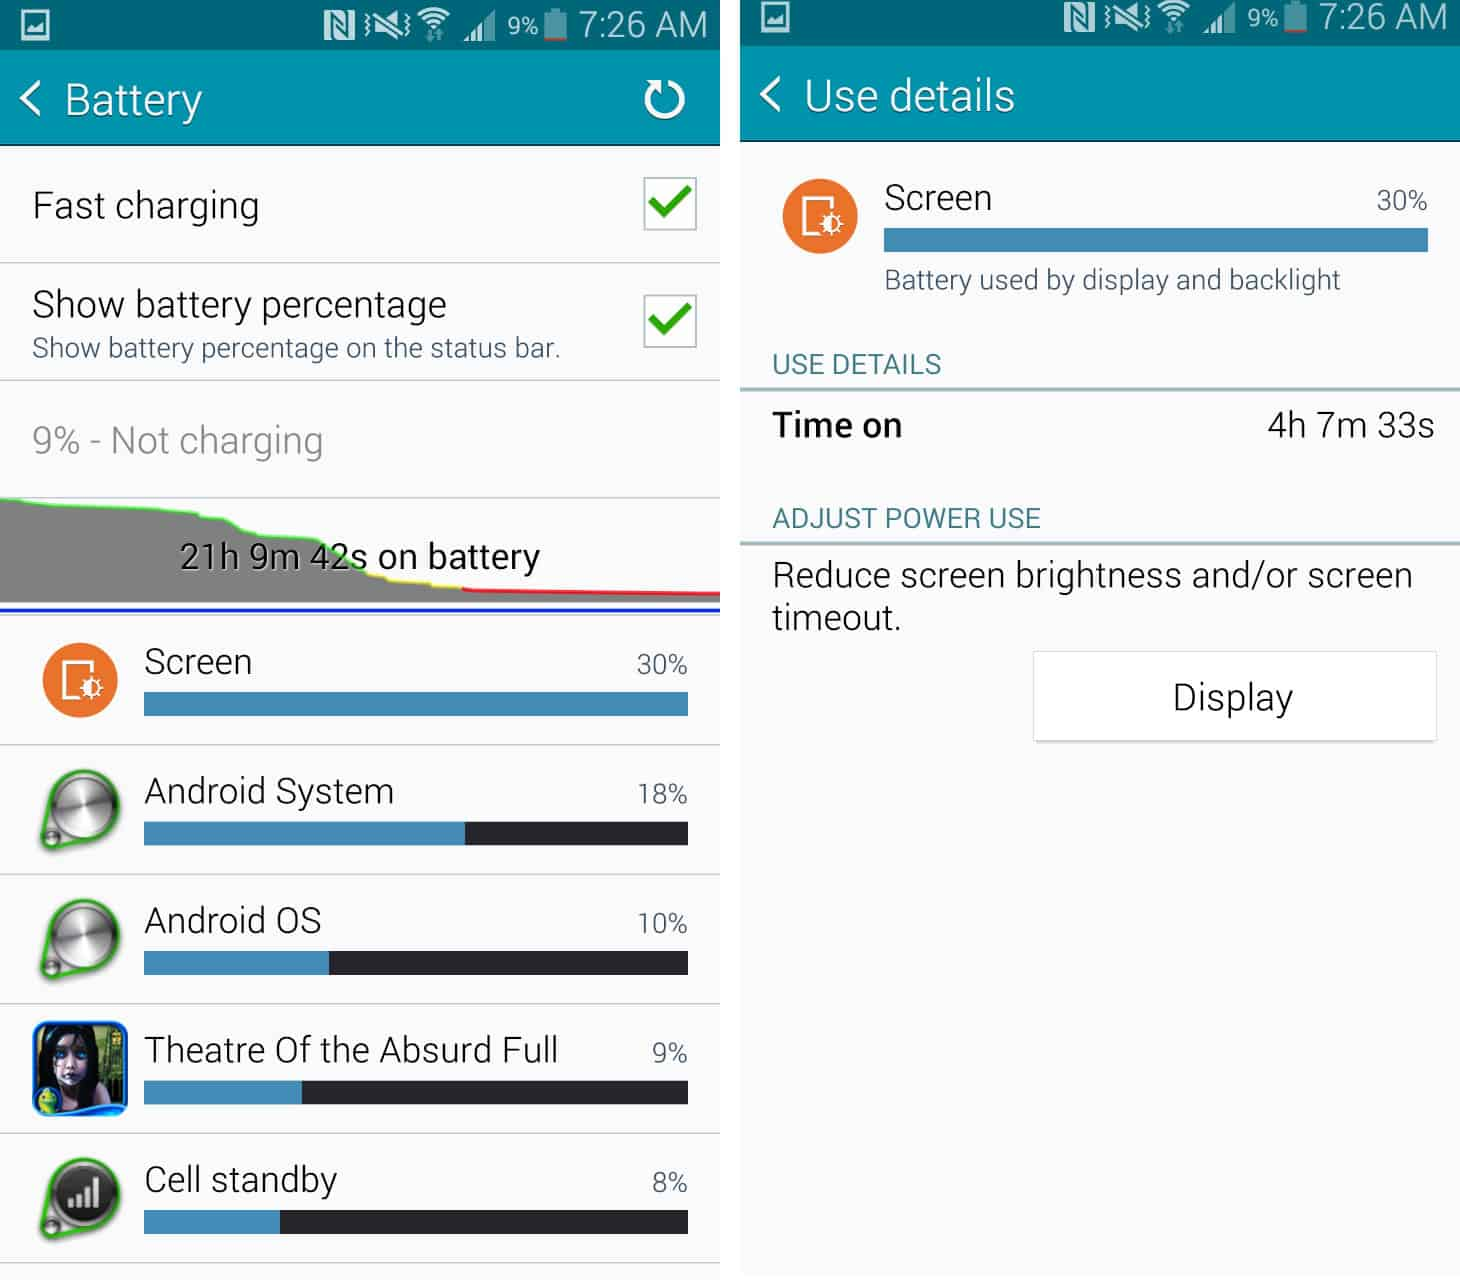 Samsung Note 4 Screenshots-6